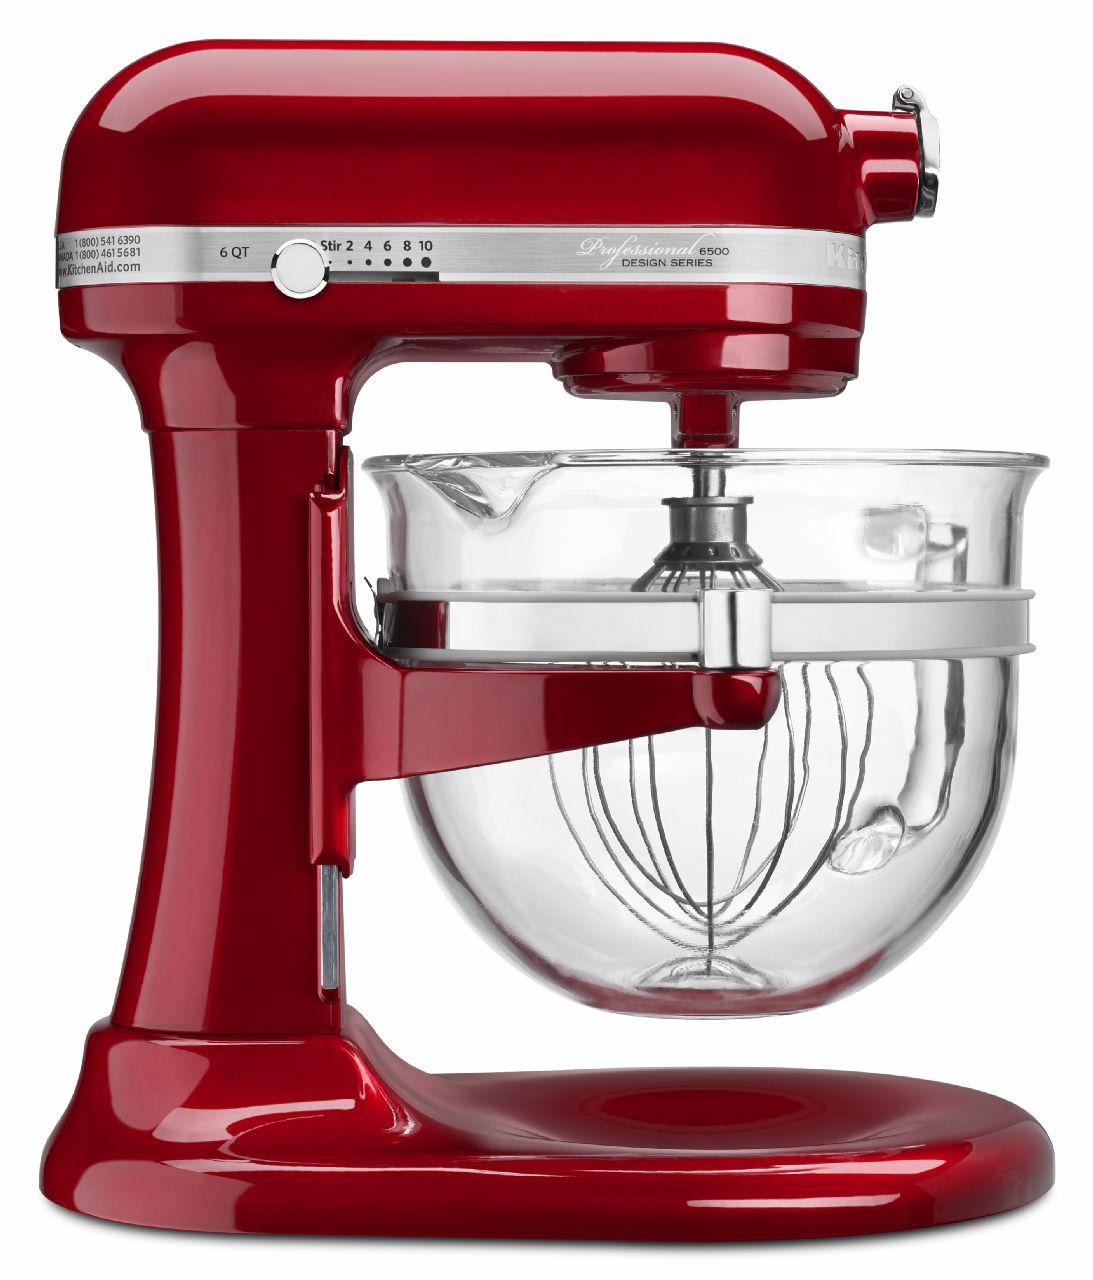 Kitchenaid Professional 6500 Design Series Bowl Lift Stand Mixer Ksm6521x